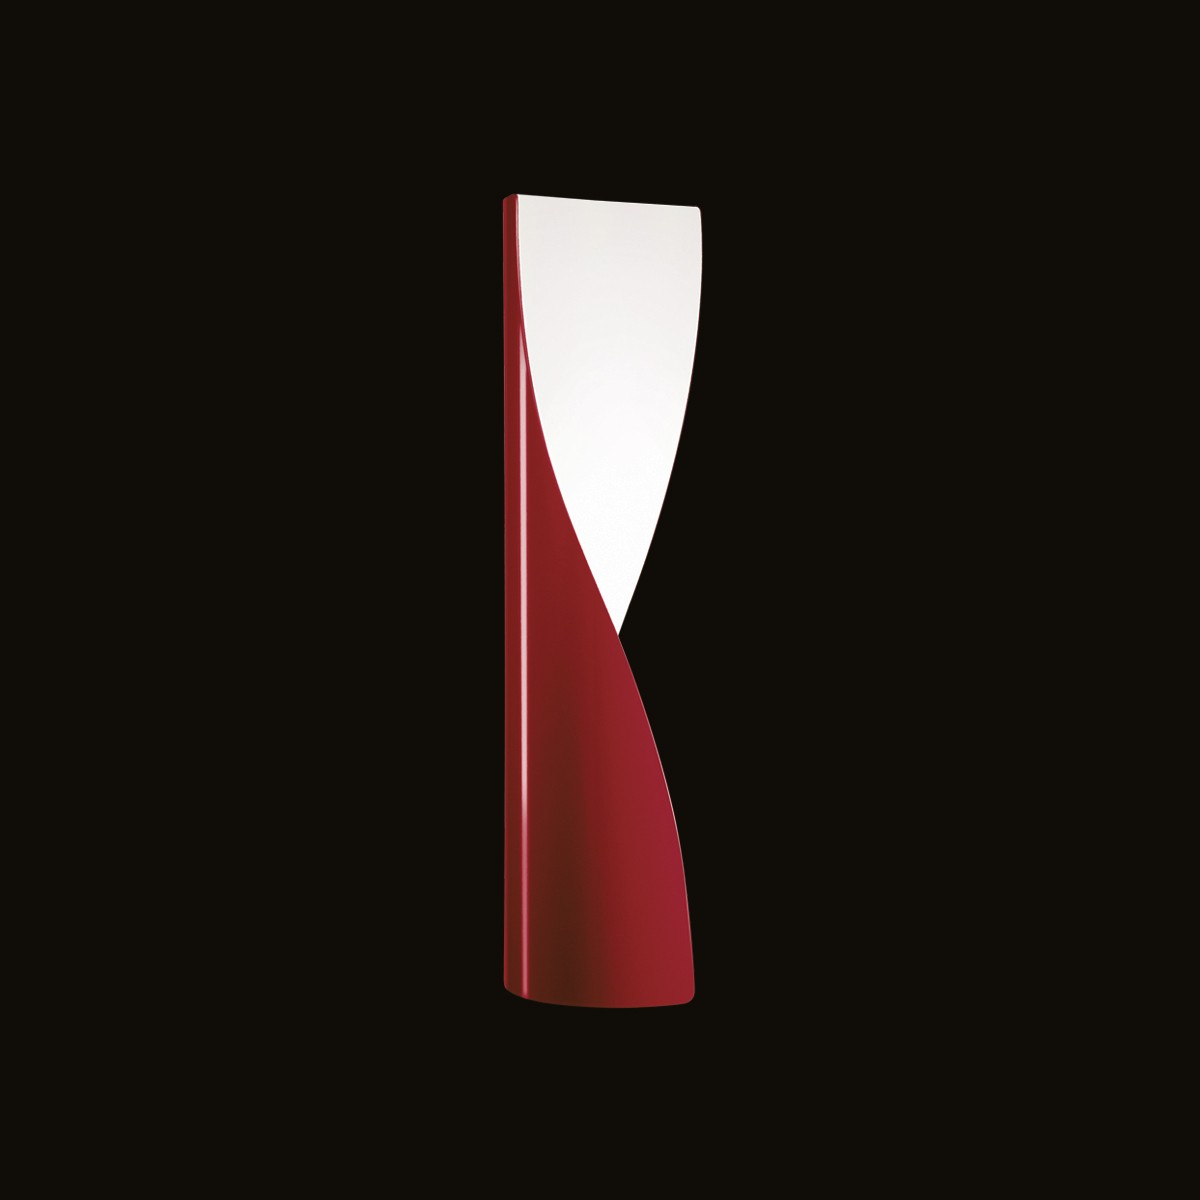 Kundalini Evita Wandleuchte, rot glänzend